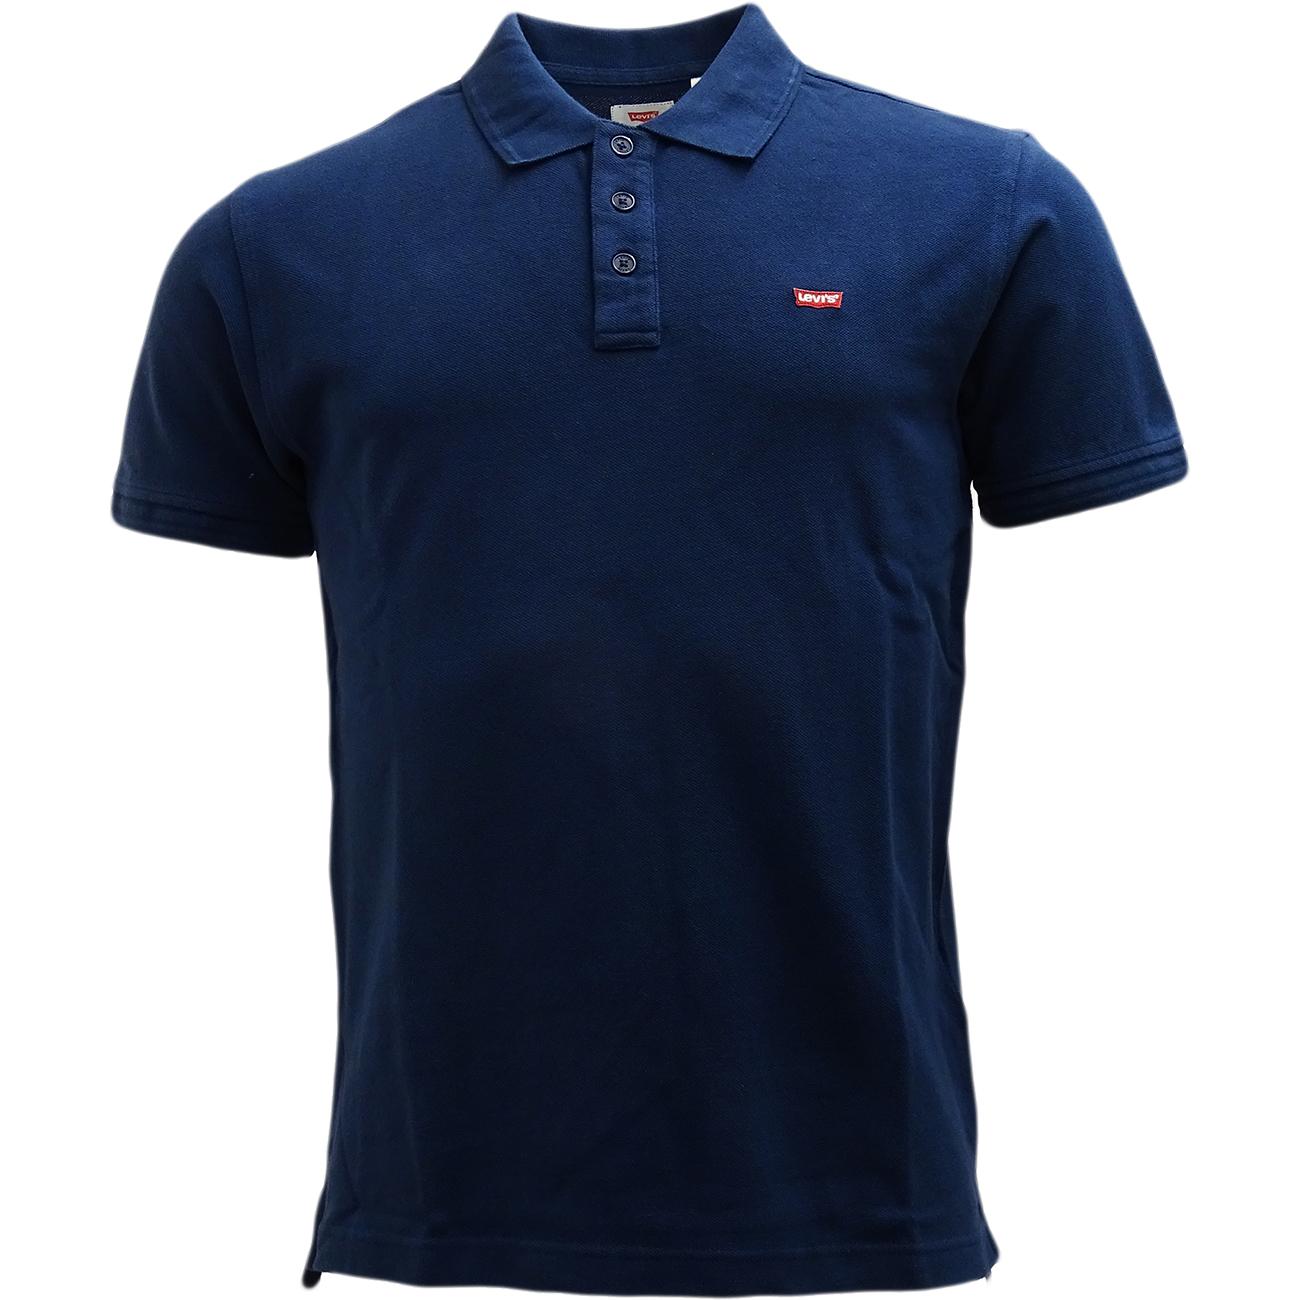 levi strauss polo shirt smart casual polo top polos